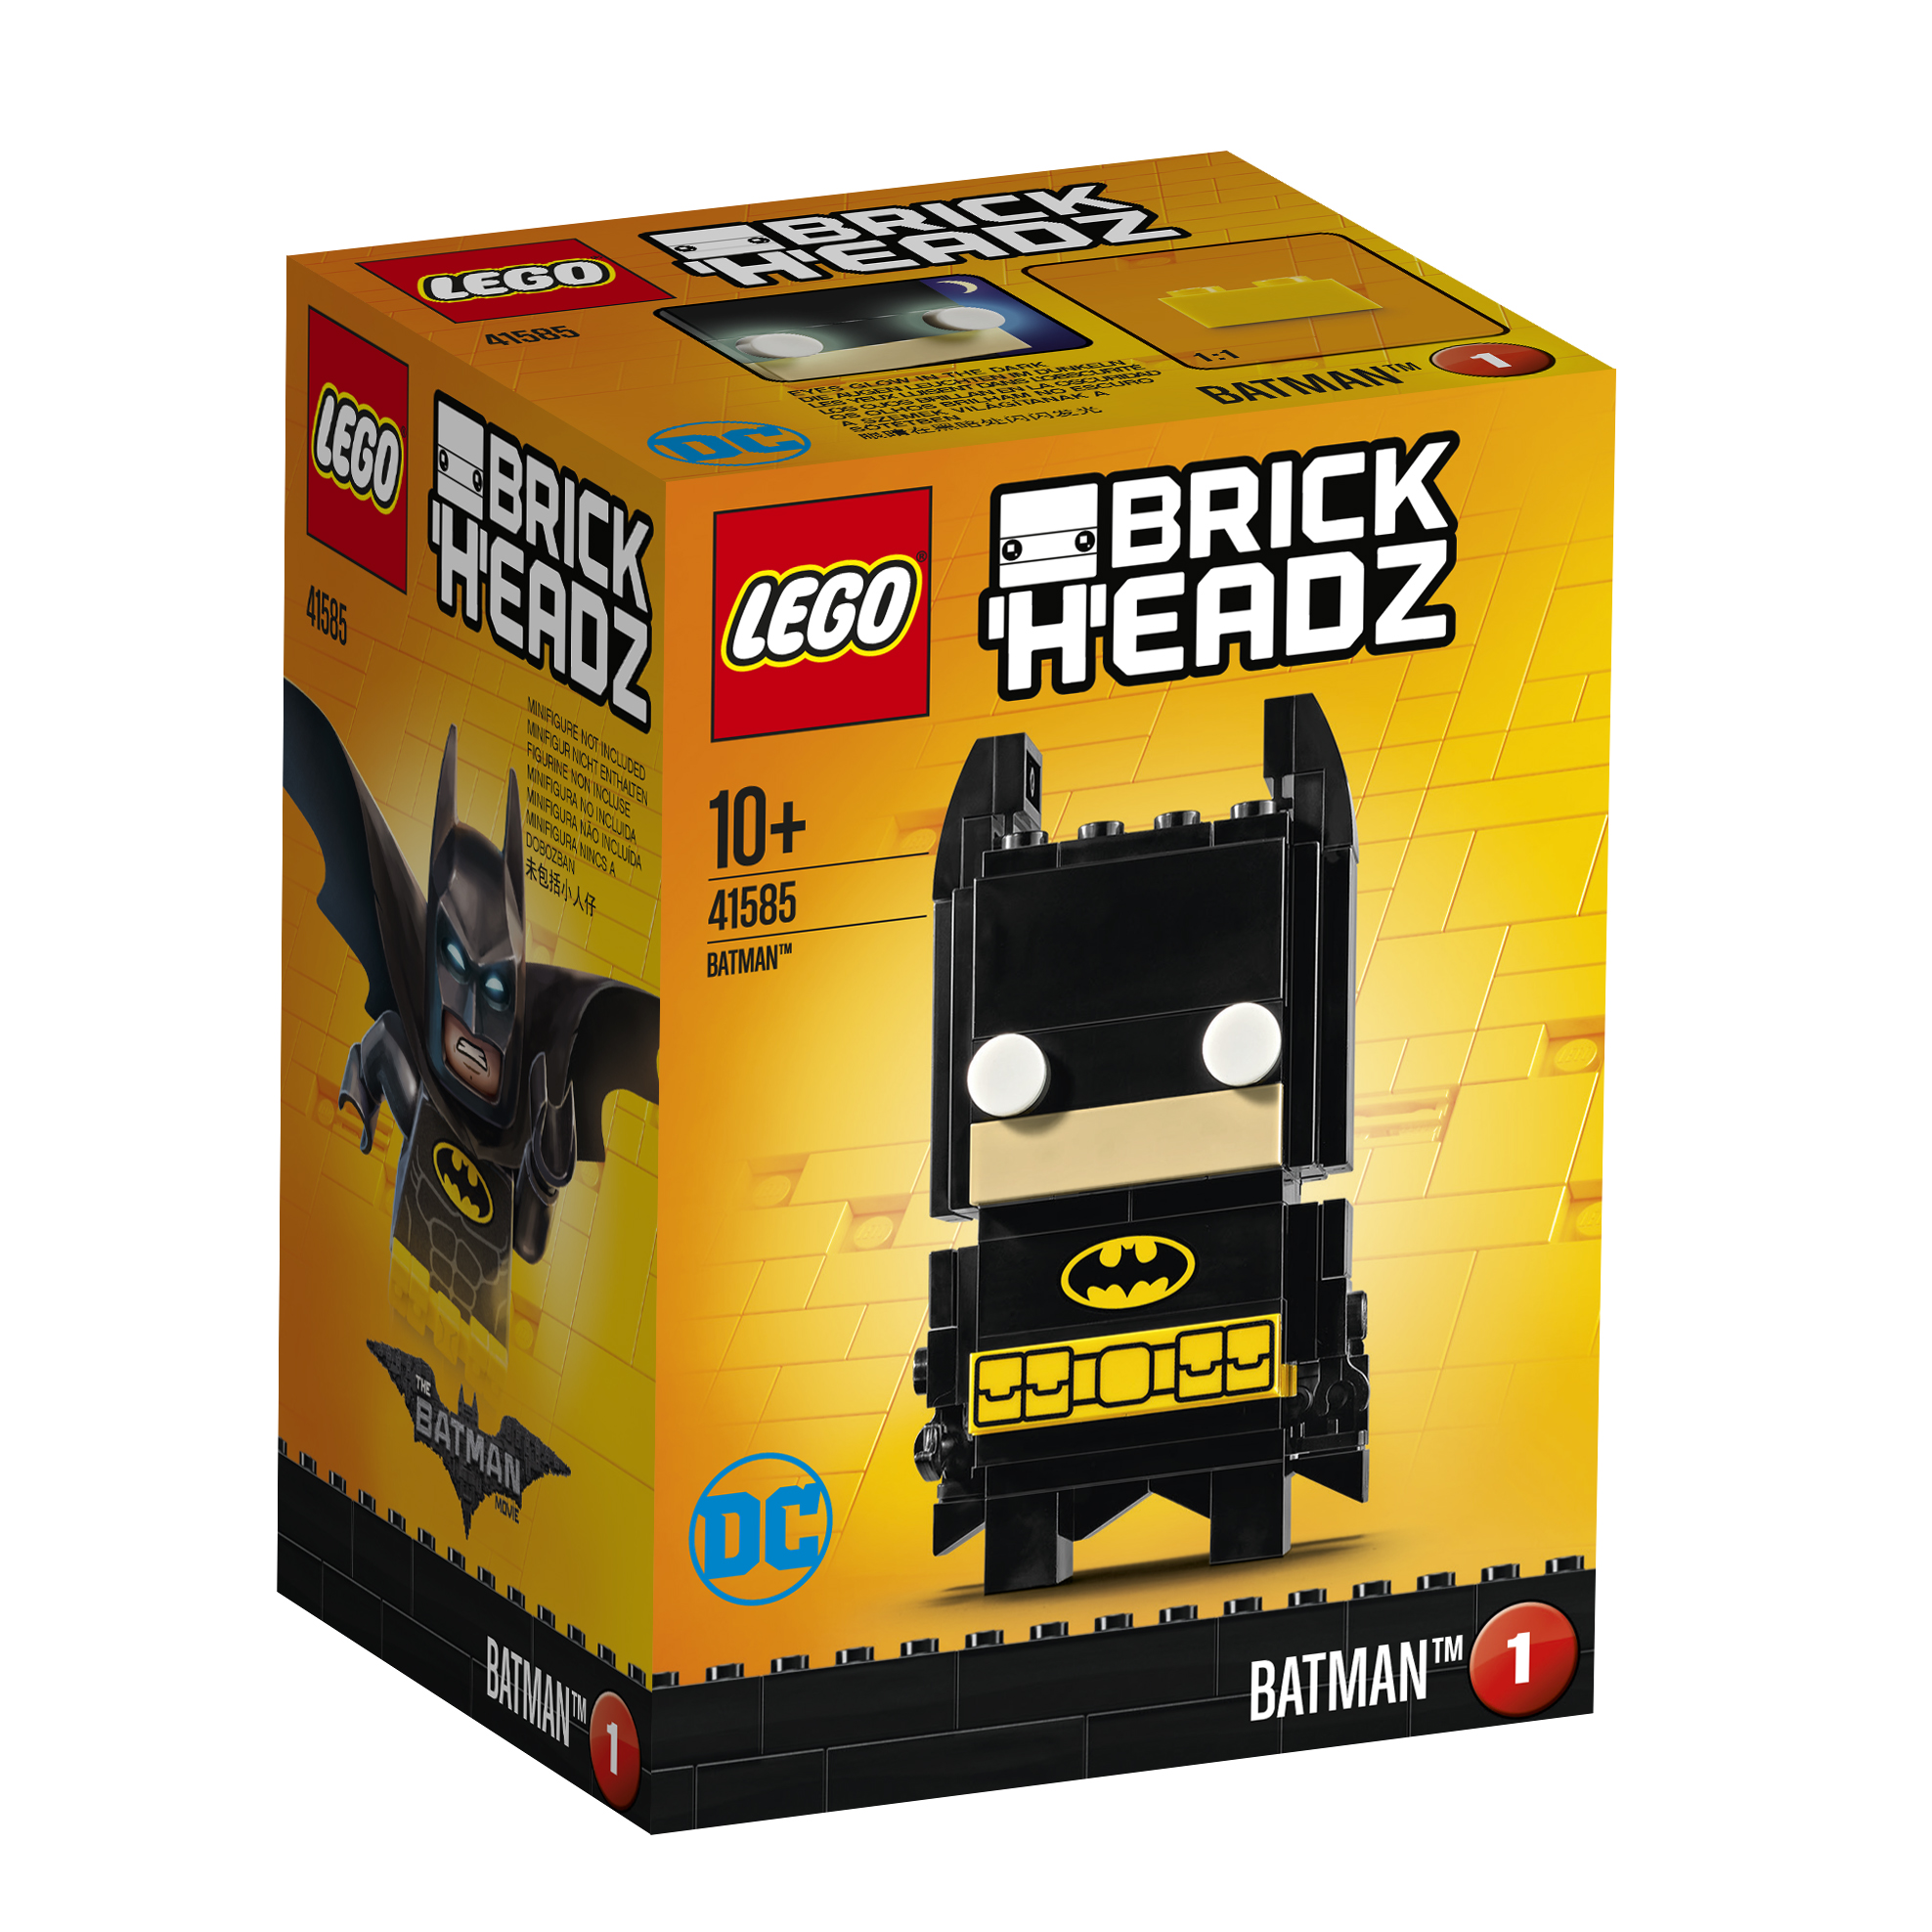 LEGO Batman Brickheadz